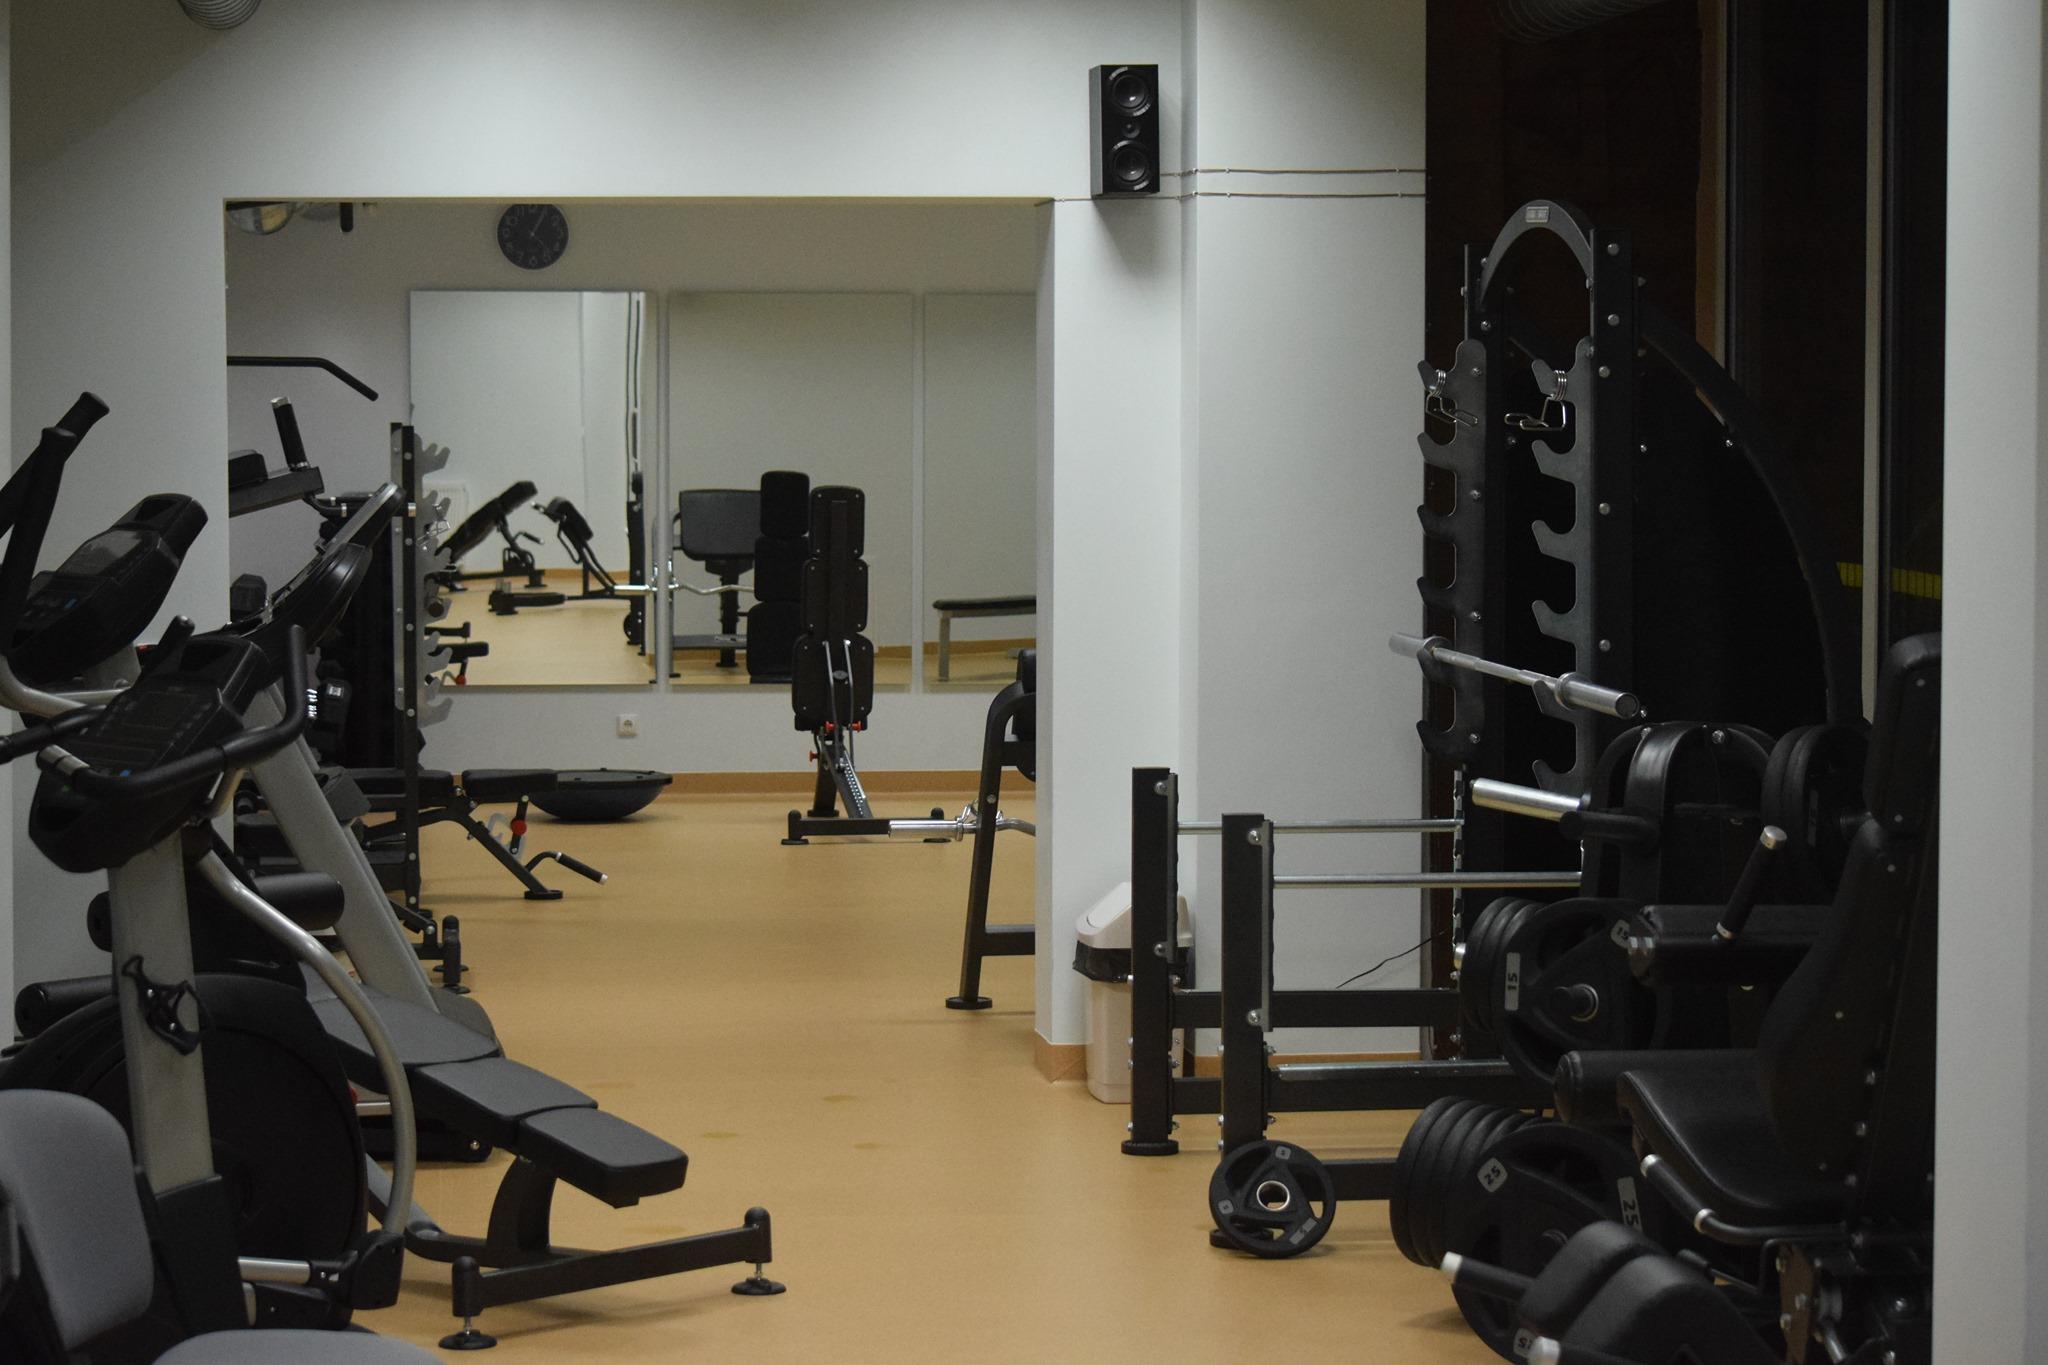 Sporto treniruociu sale